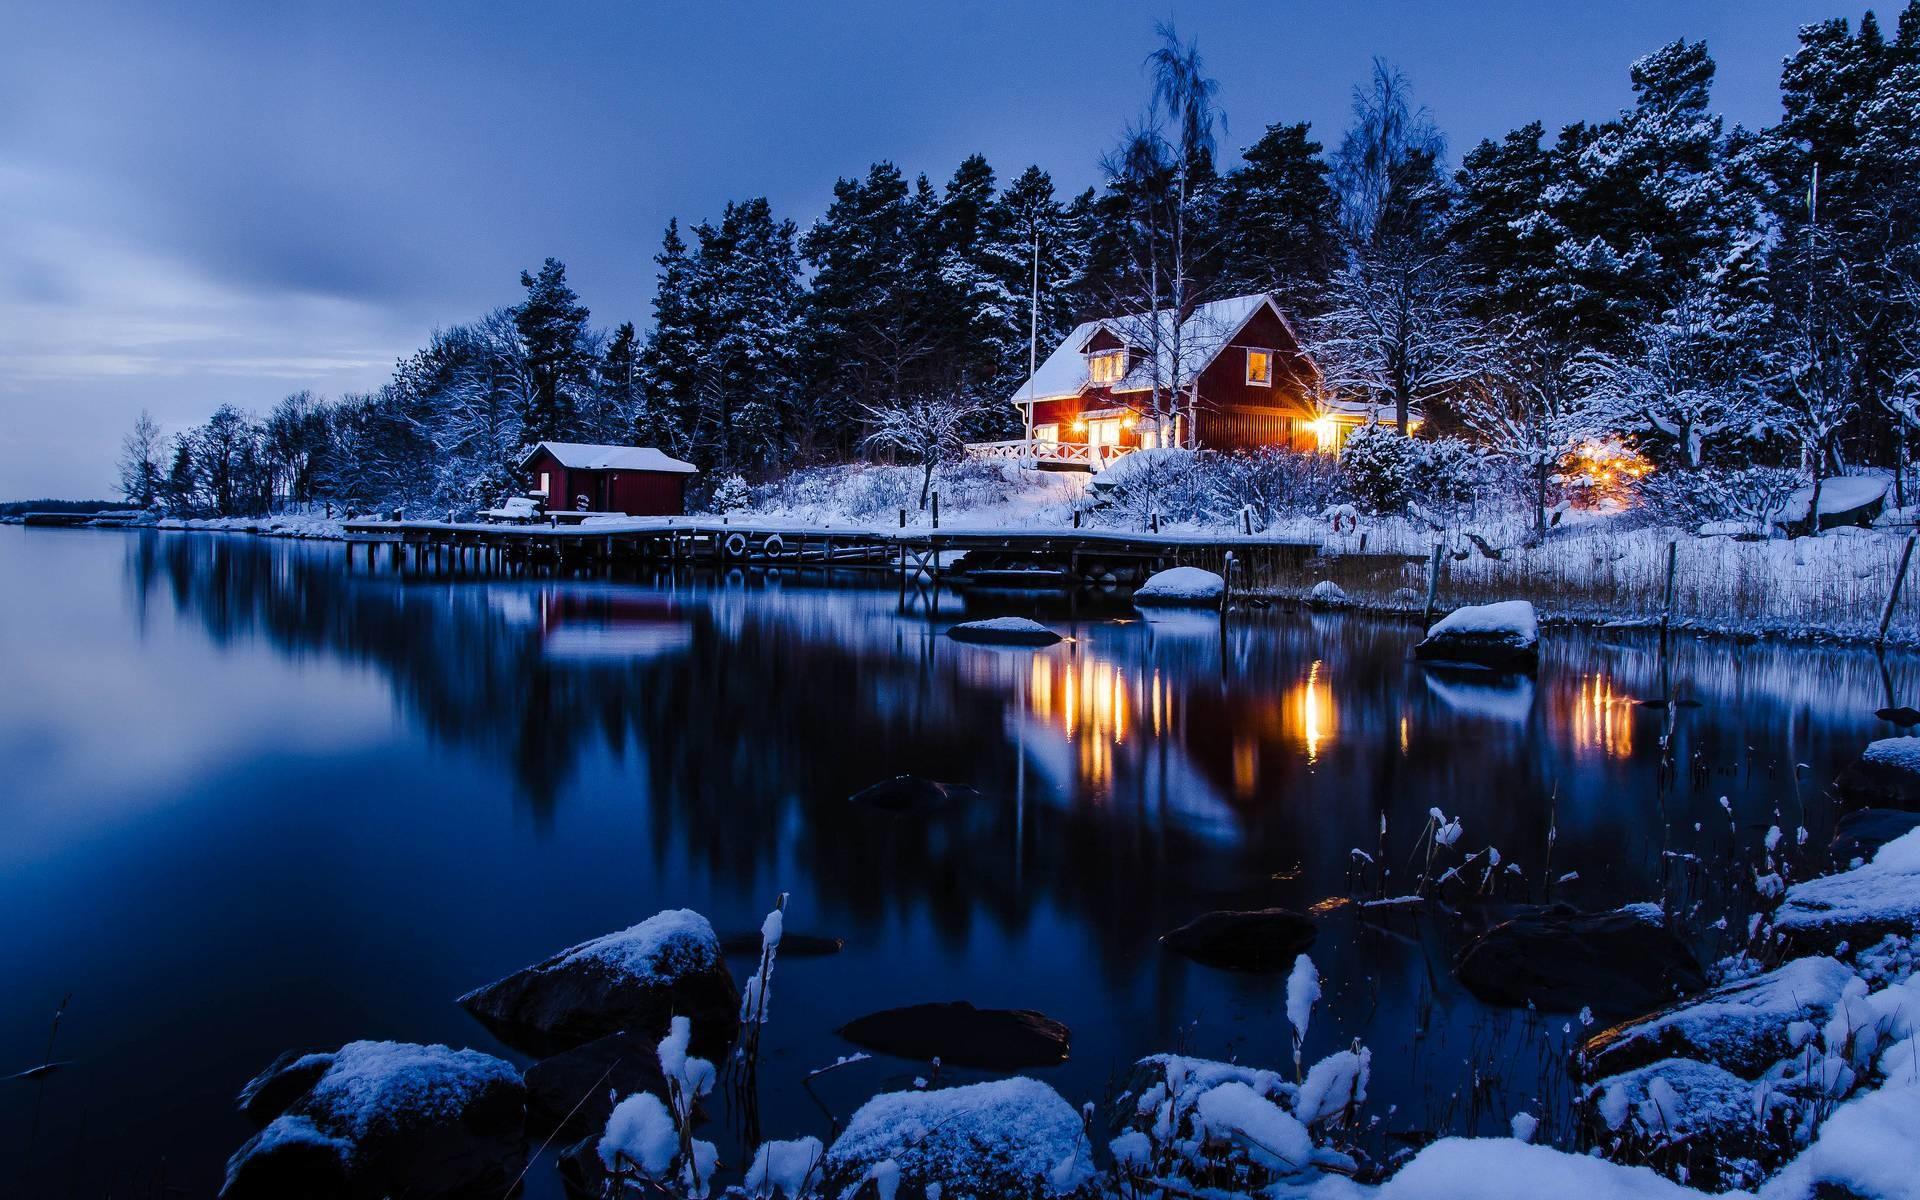 Winter Night Wallpapers – Full HD wallpaper search